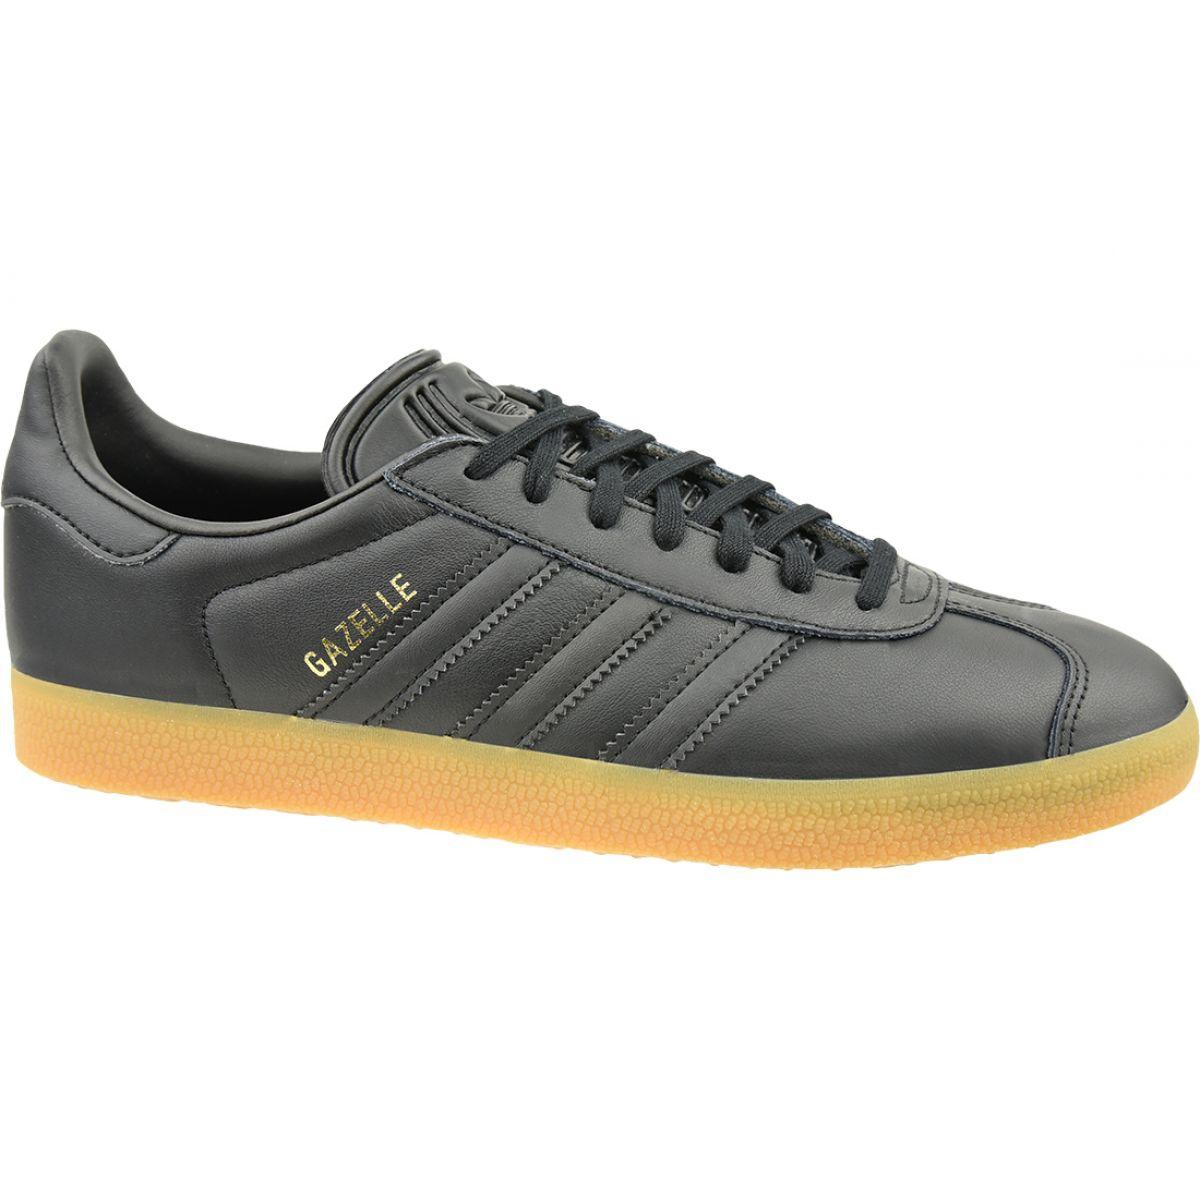 Adidas Gazelle M BD7480 chaussures noir | eBay